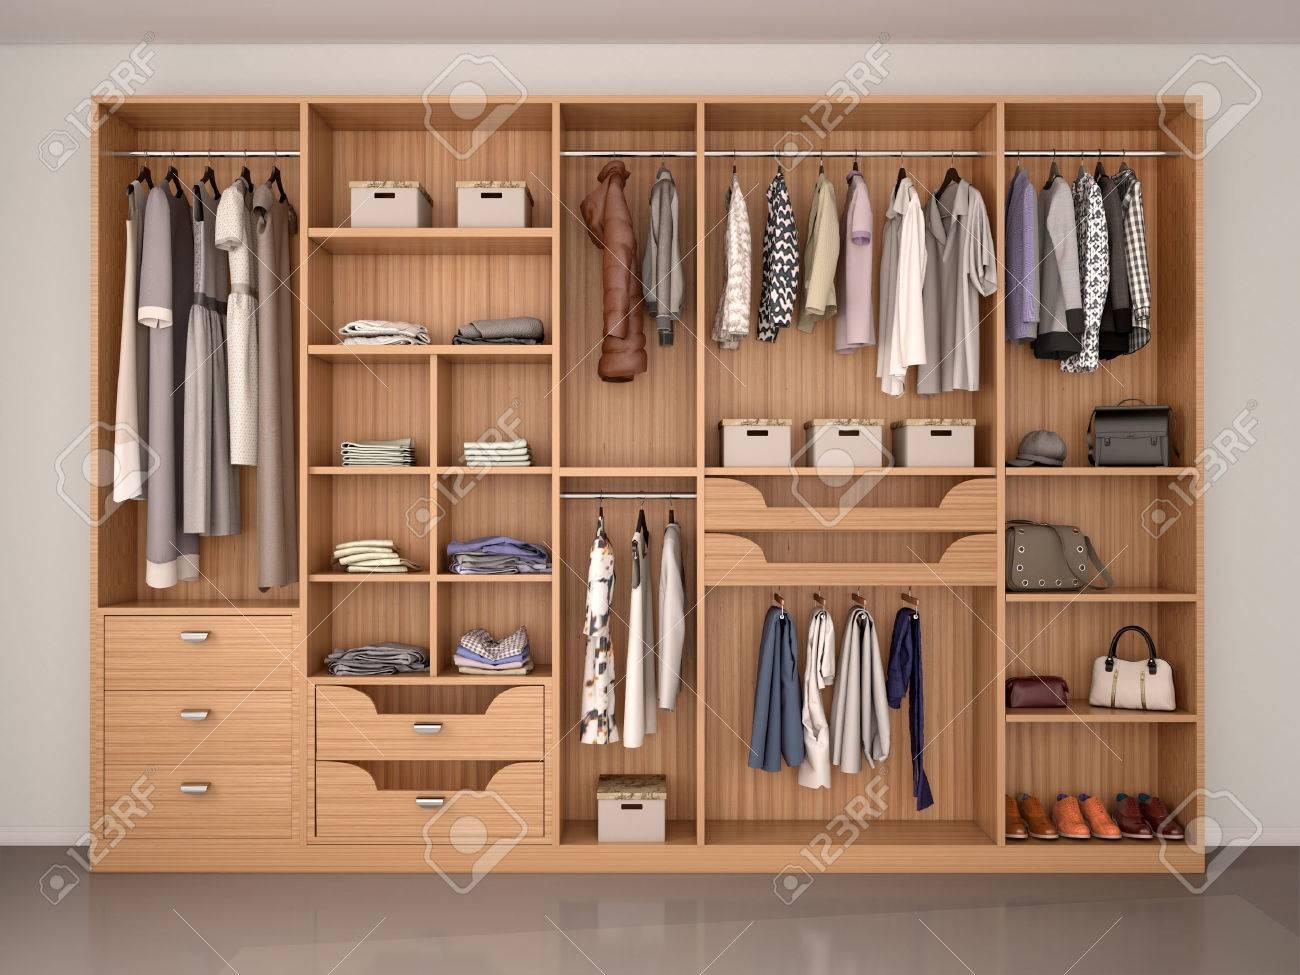 Illustration wooden wardrobe closet full of different things 3d illustration